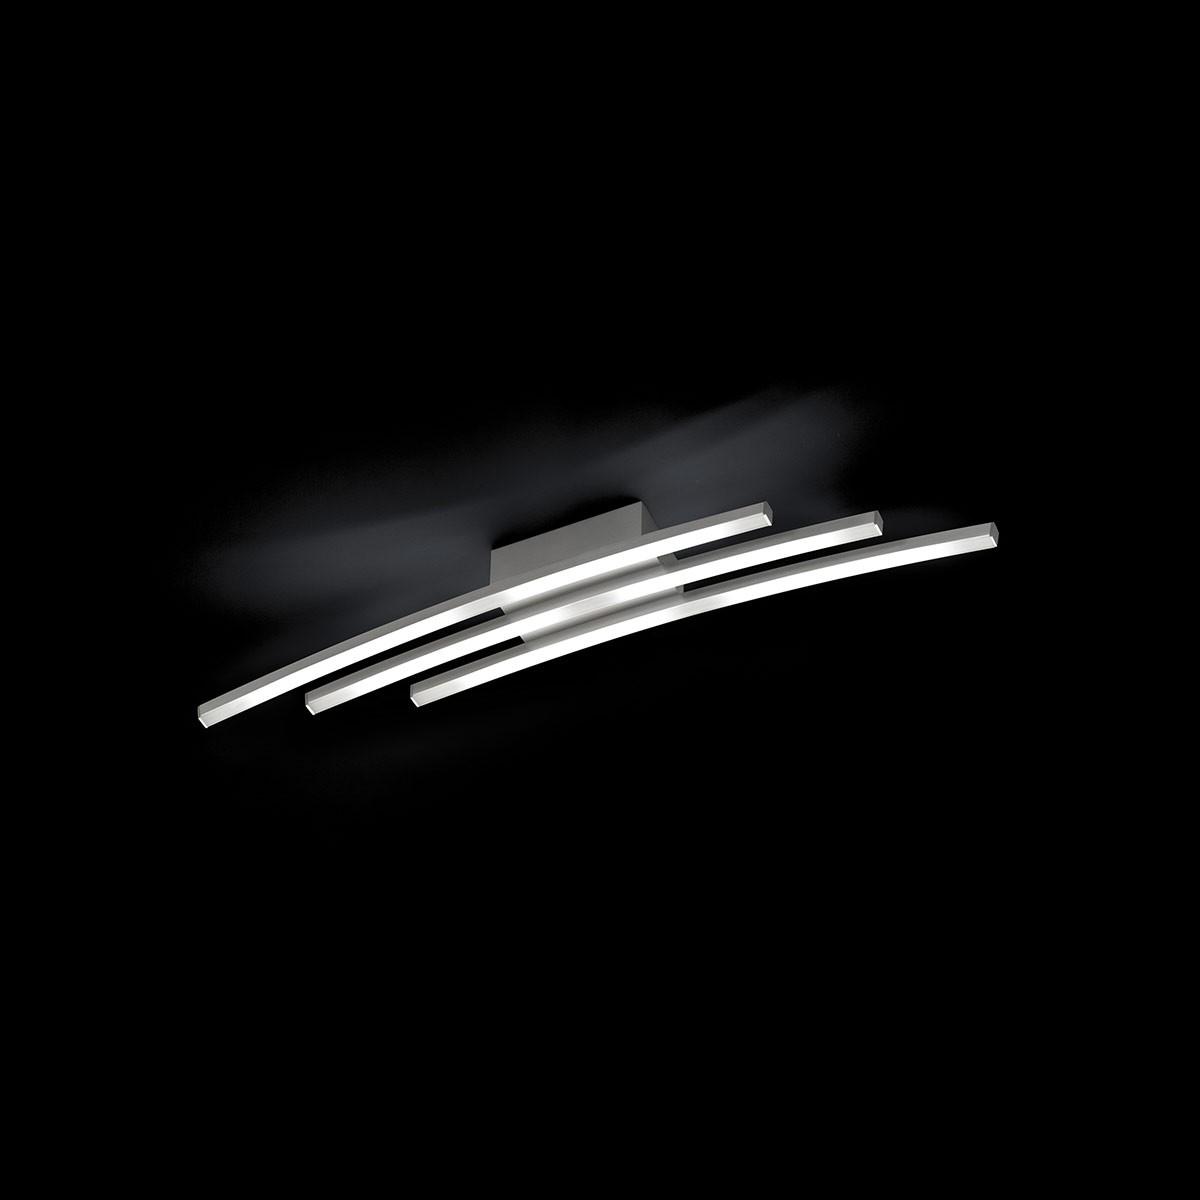 Grossmann Piano LED Deckenleuchte, Aluminium, 10 x 79,4 cm